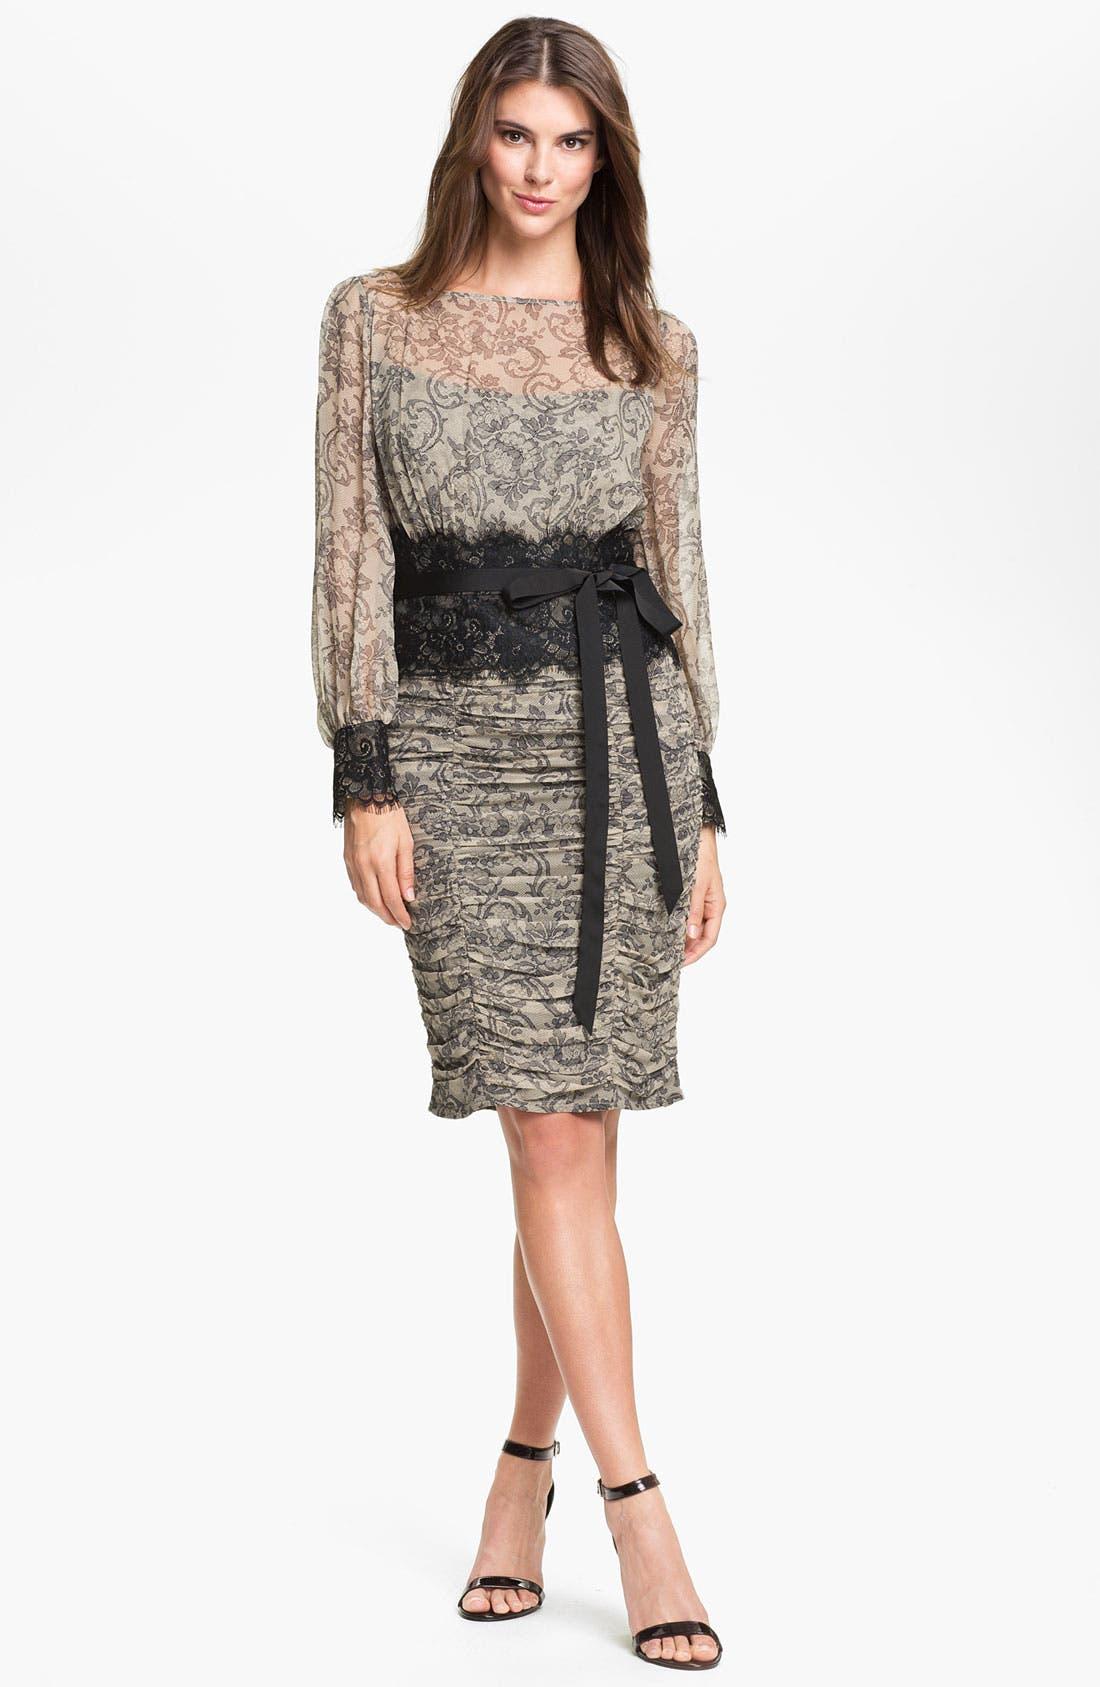 Alternate Image 1 Selected - Tadashi Shoji Print Silk & Lace Dress (Online Only)